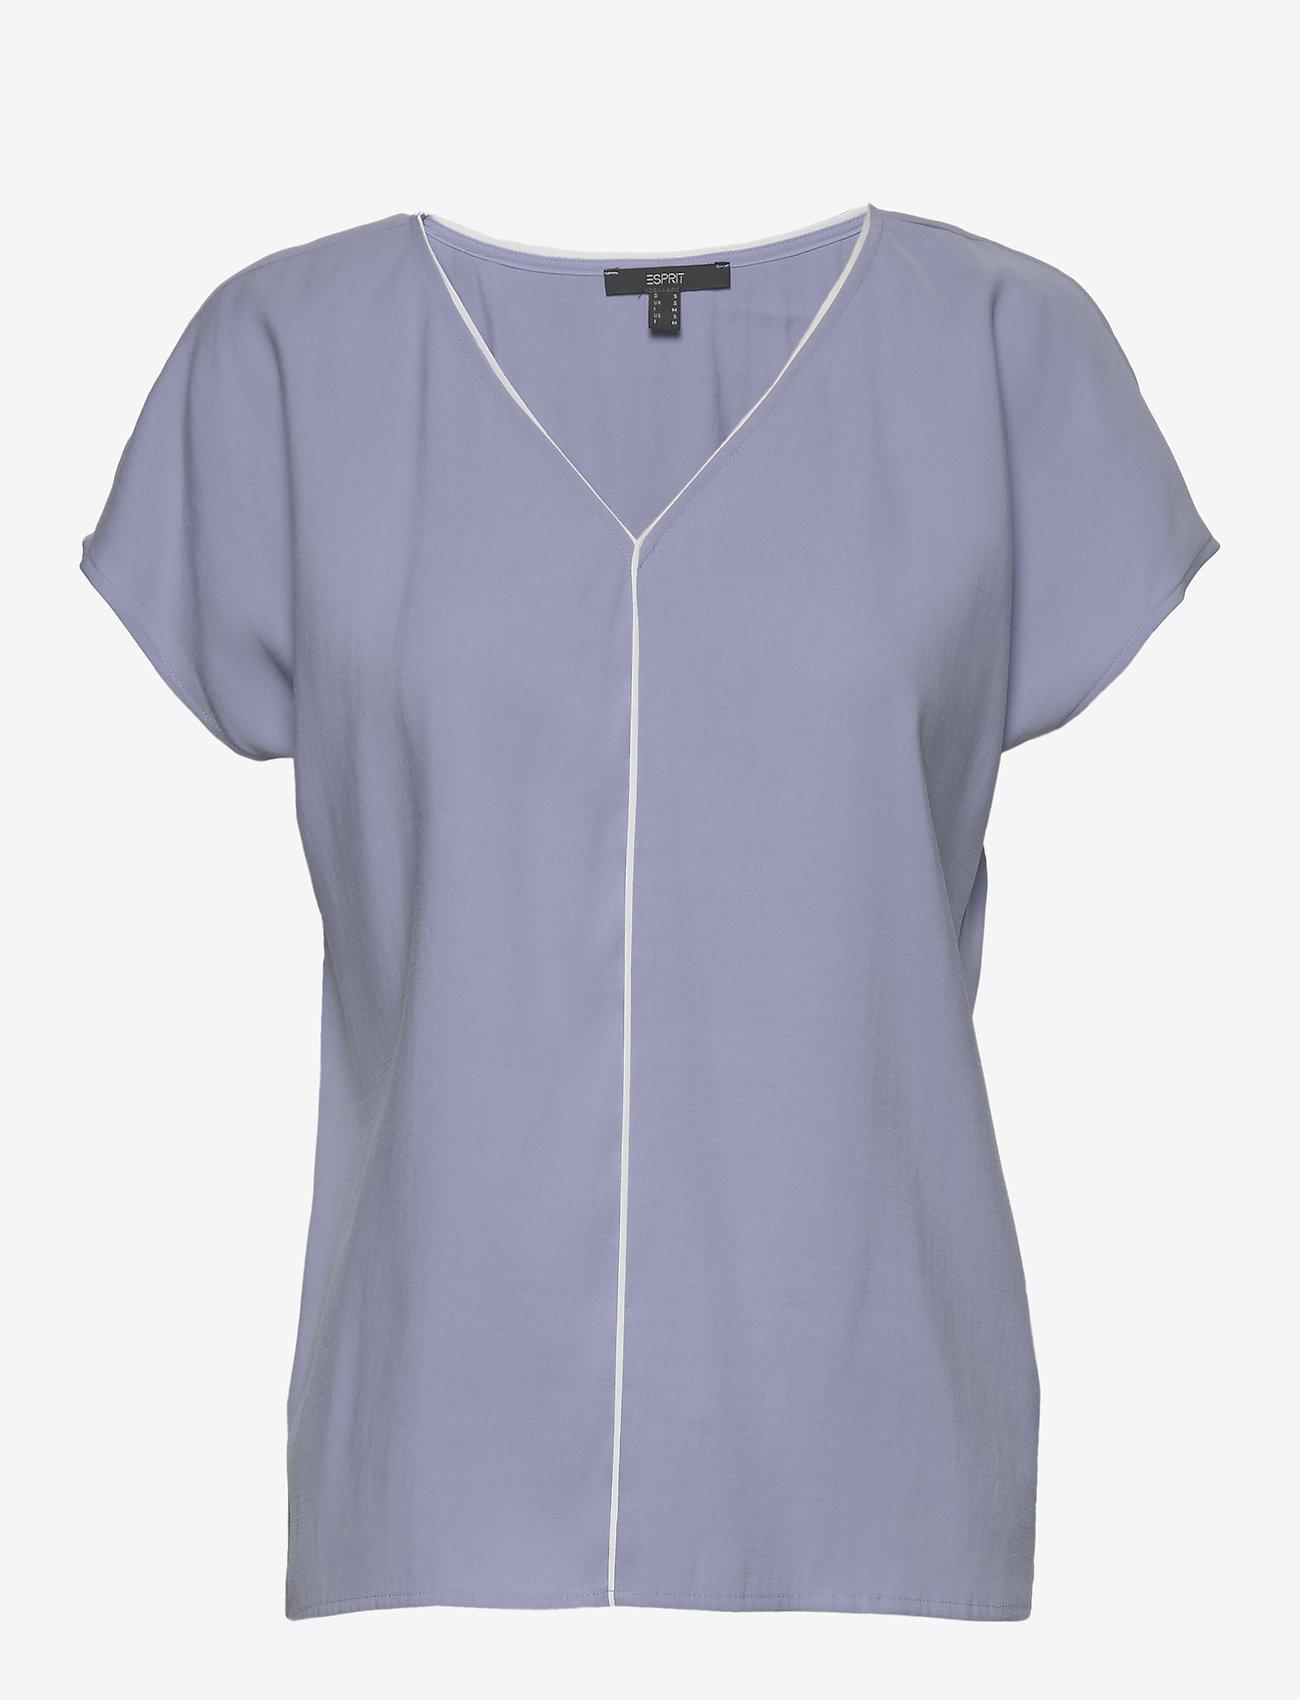 Esprit Collection - Blouses woven - kortermede bluser - blue lavender - 0